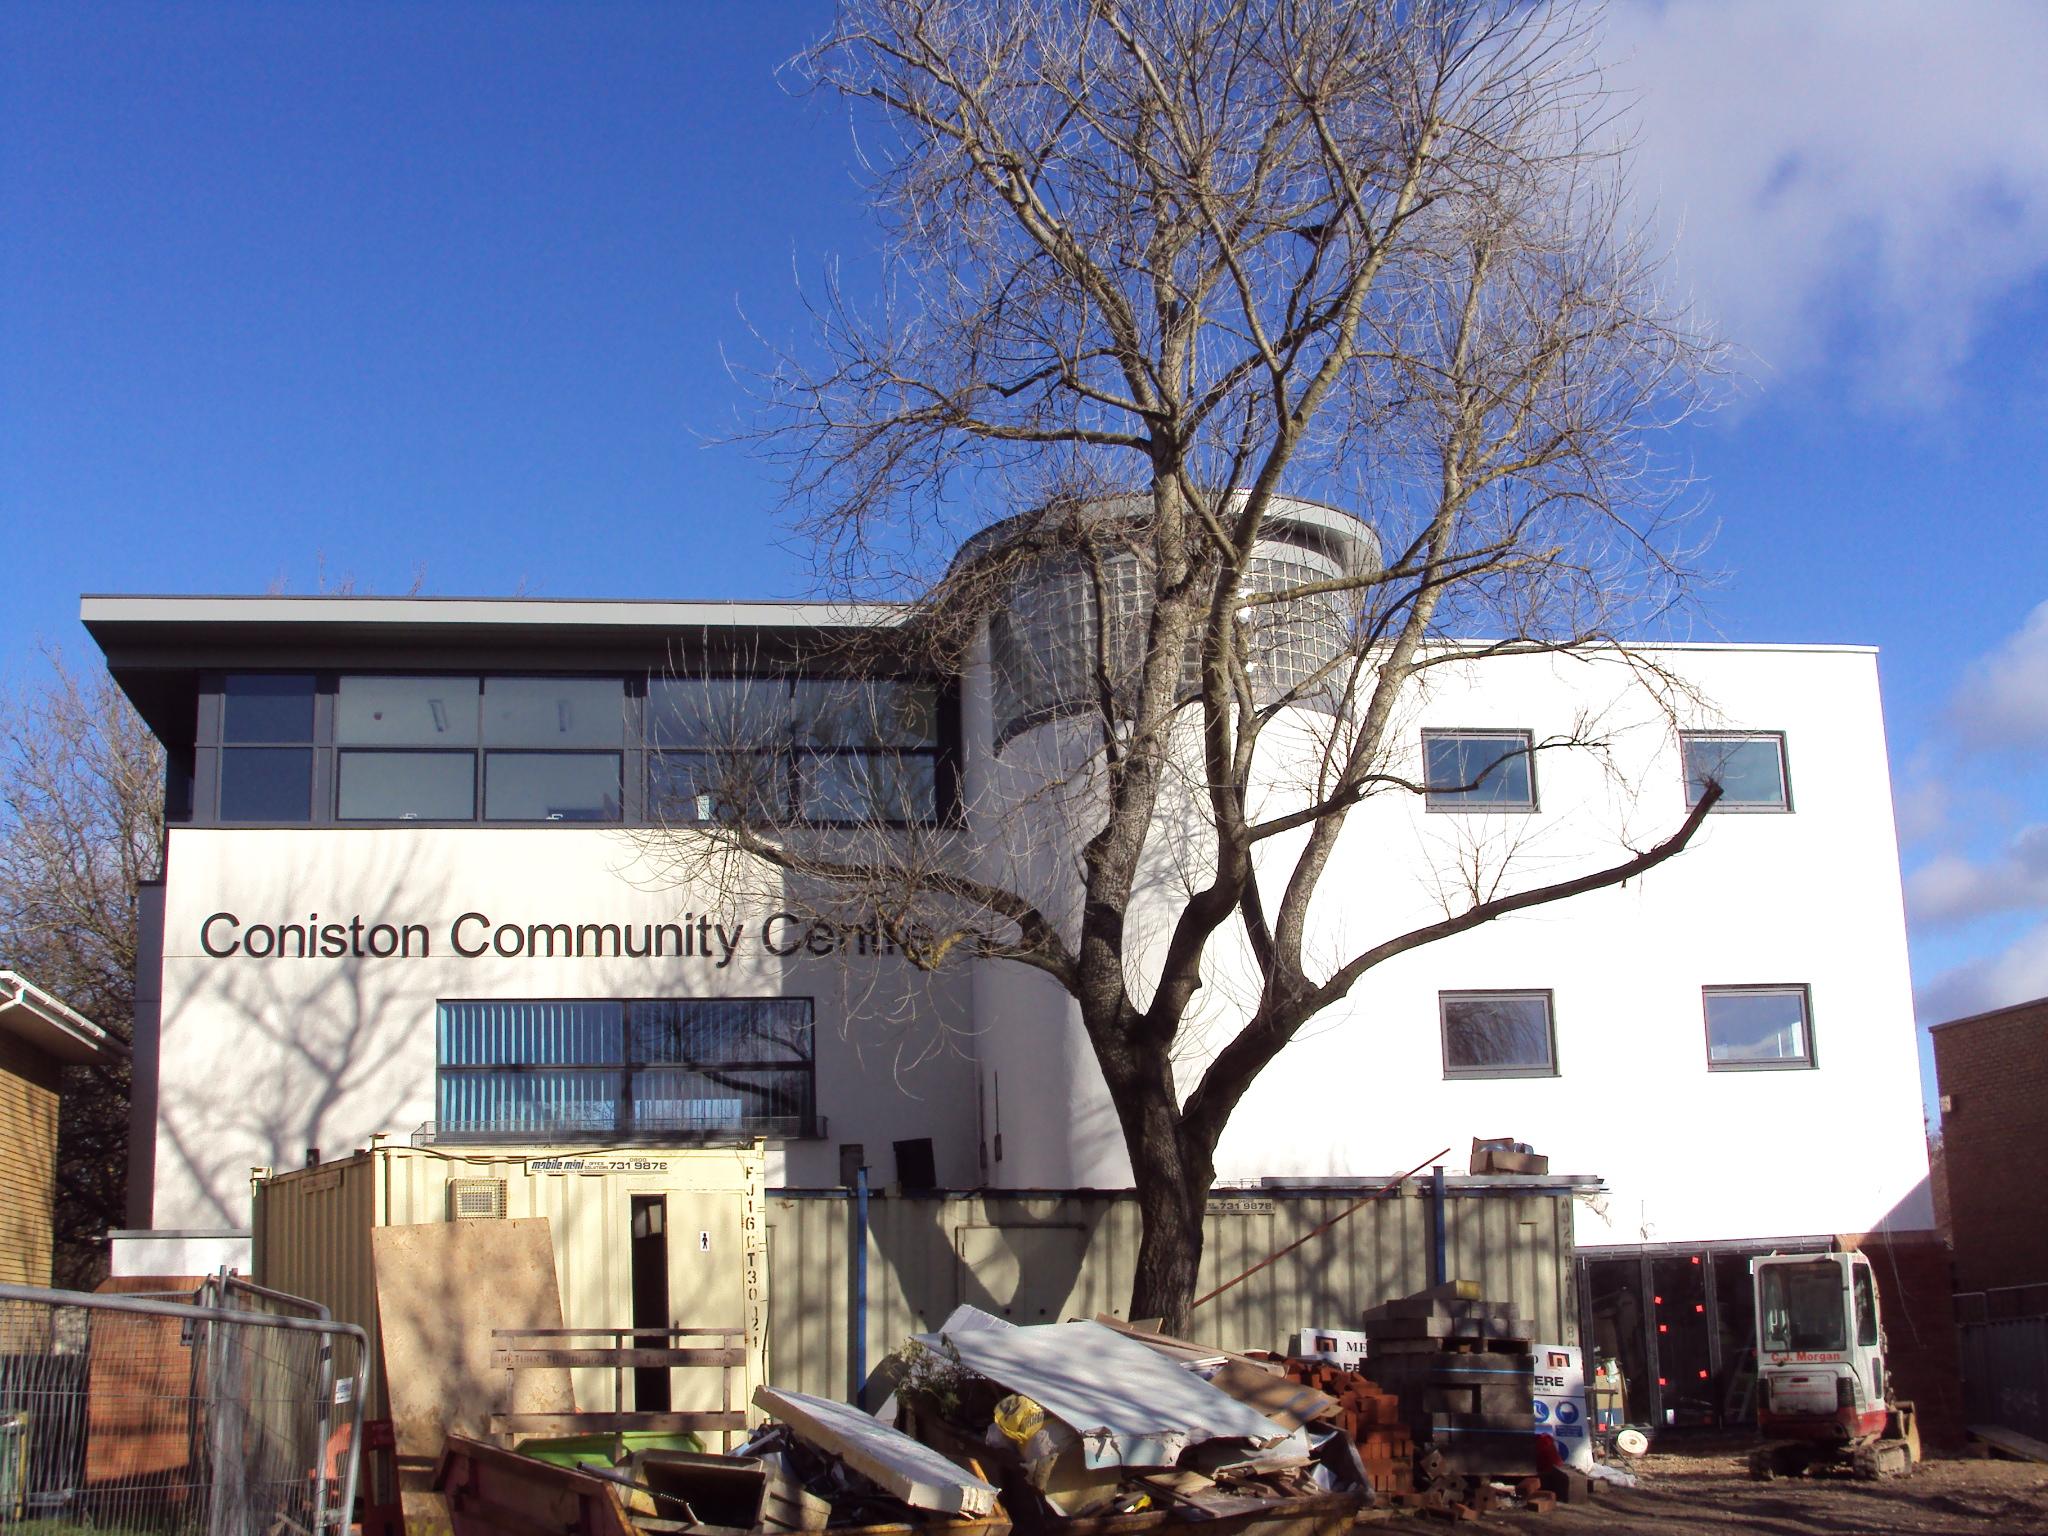 Coniston Community Centre Pro Structures Ltd